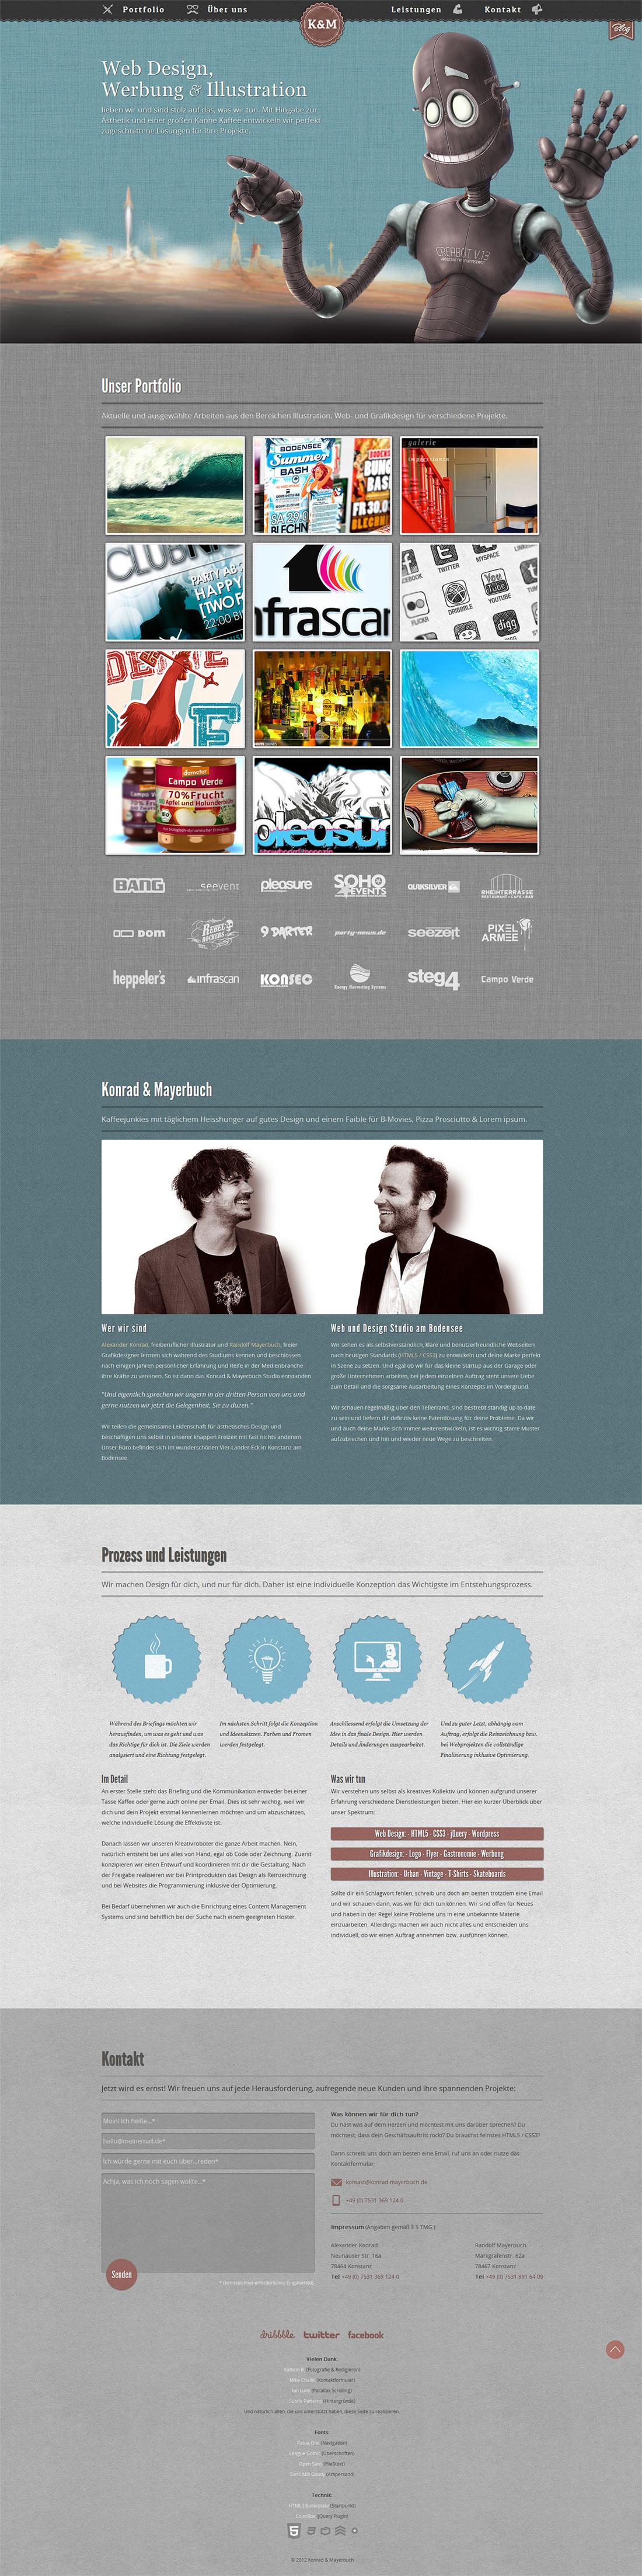 Konrad & Mayerbuch Website Screenshot